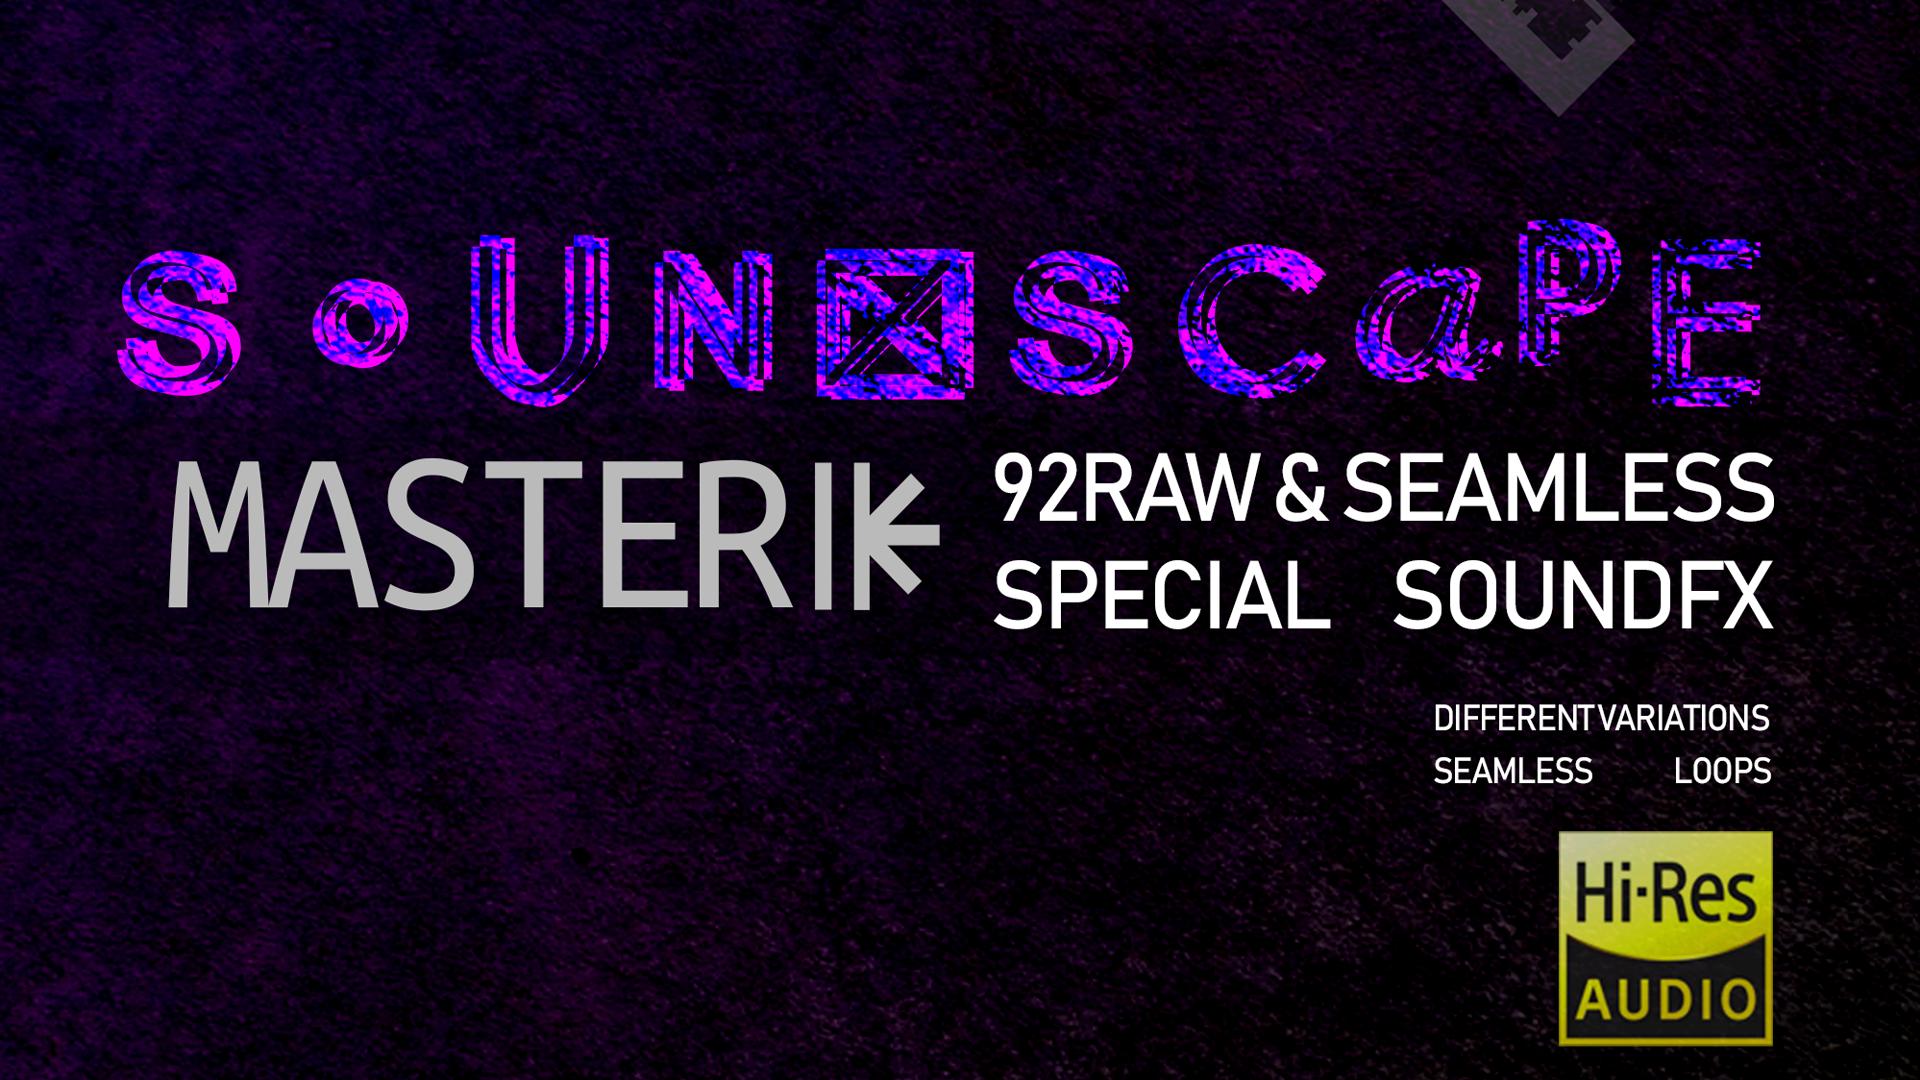 Soundscape Master by Hutvarev in Sound Effects - UE4 Marketplace